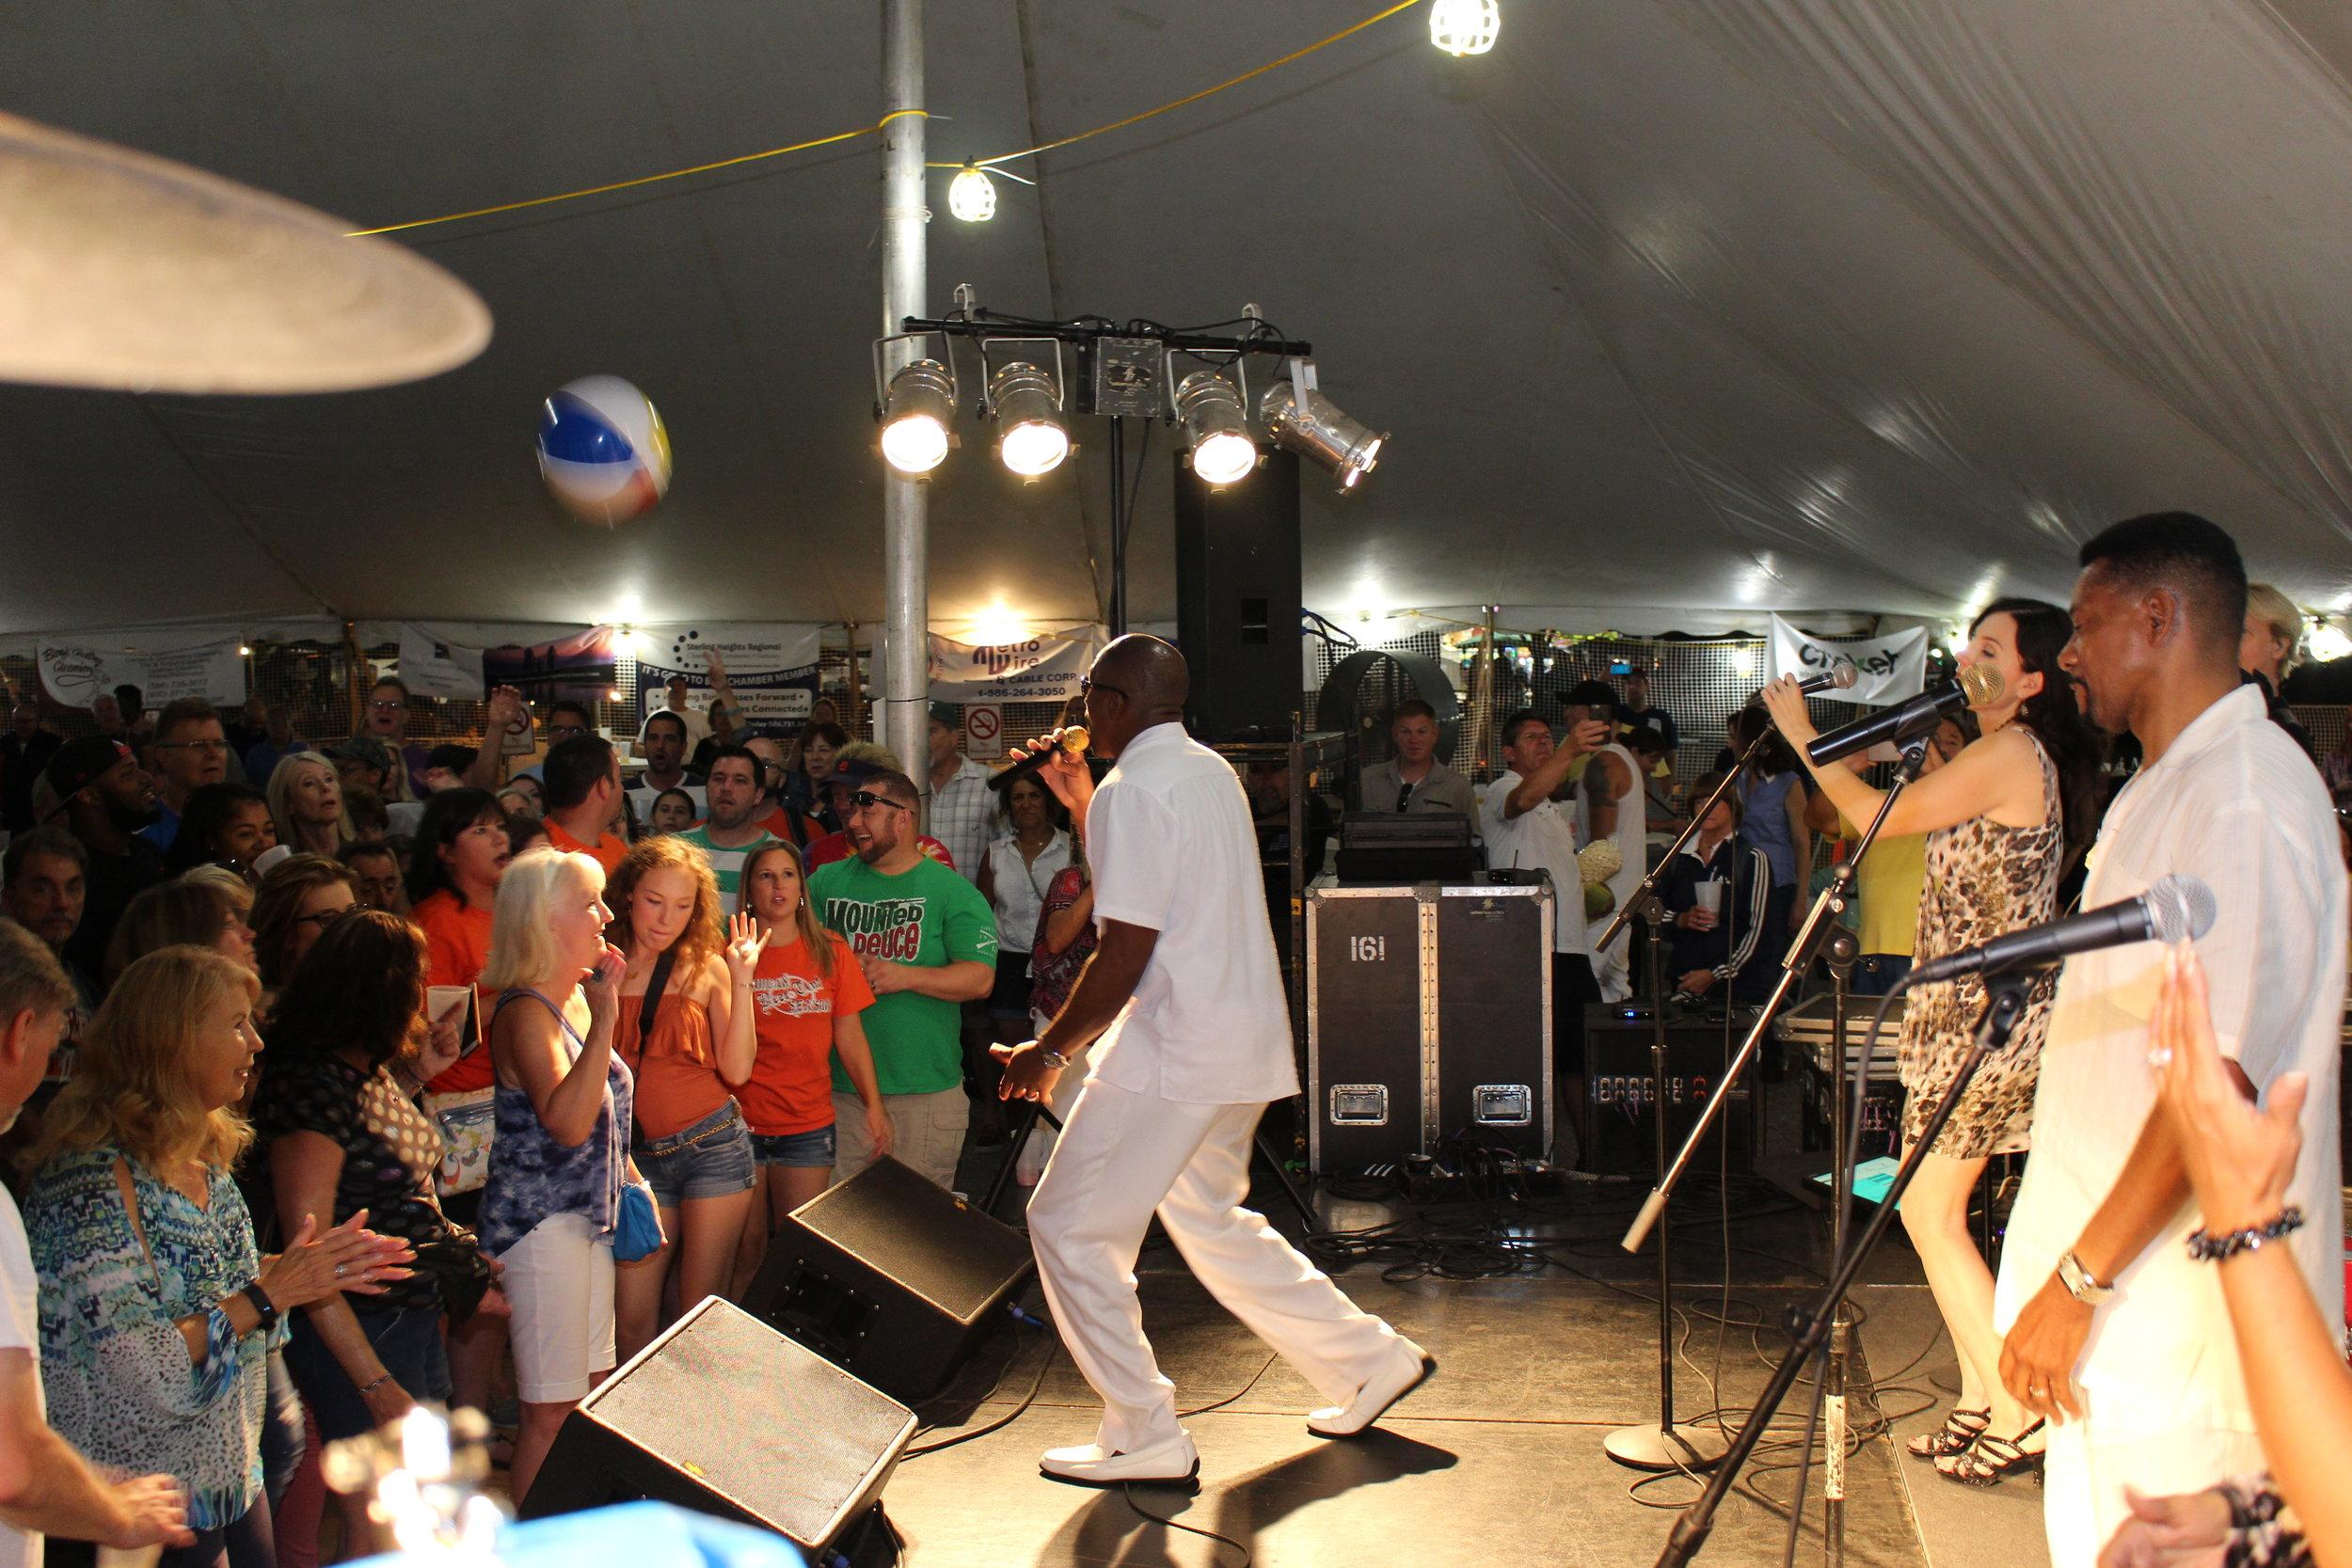 Rich tent crowd 3.JPG